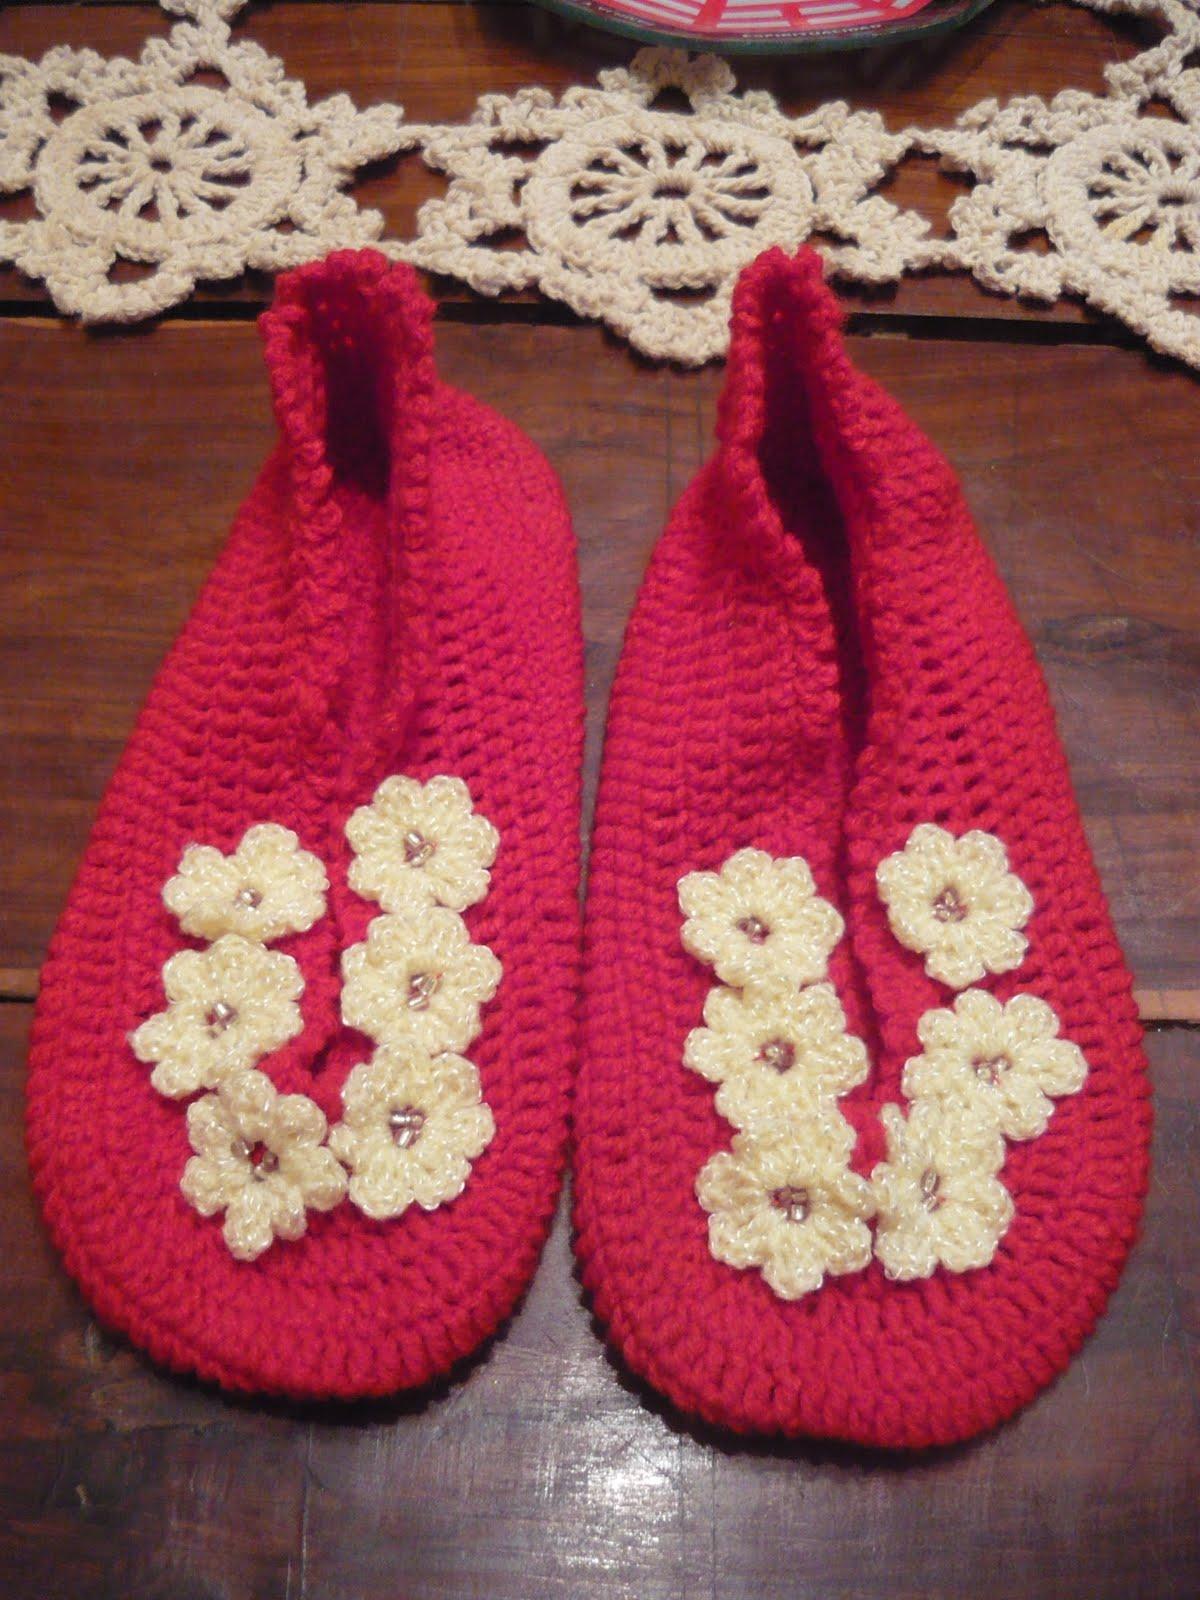 Pin Patrones De Mantas Tejidas A Crochet Para Bebes 2mapa Org Pelauts ...